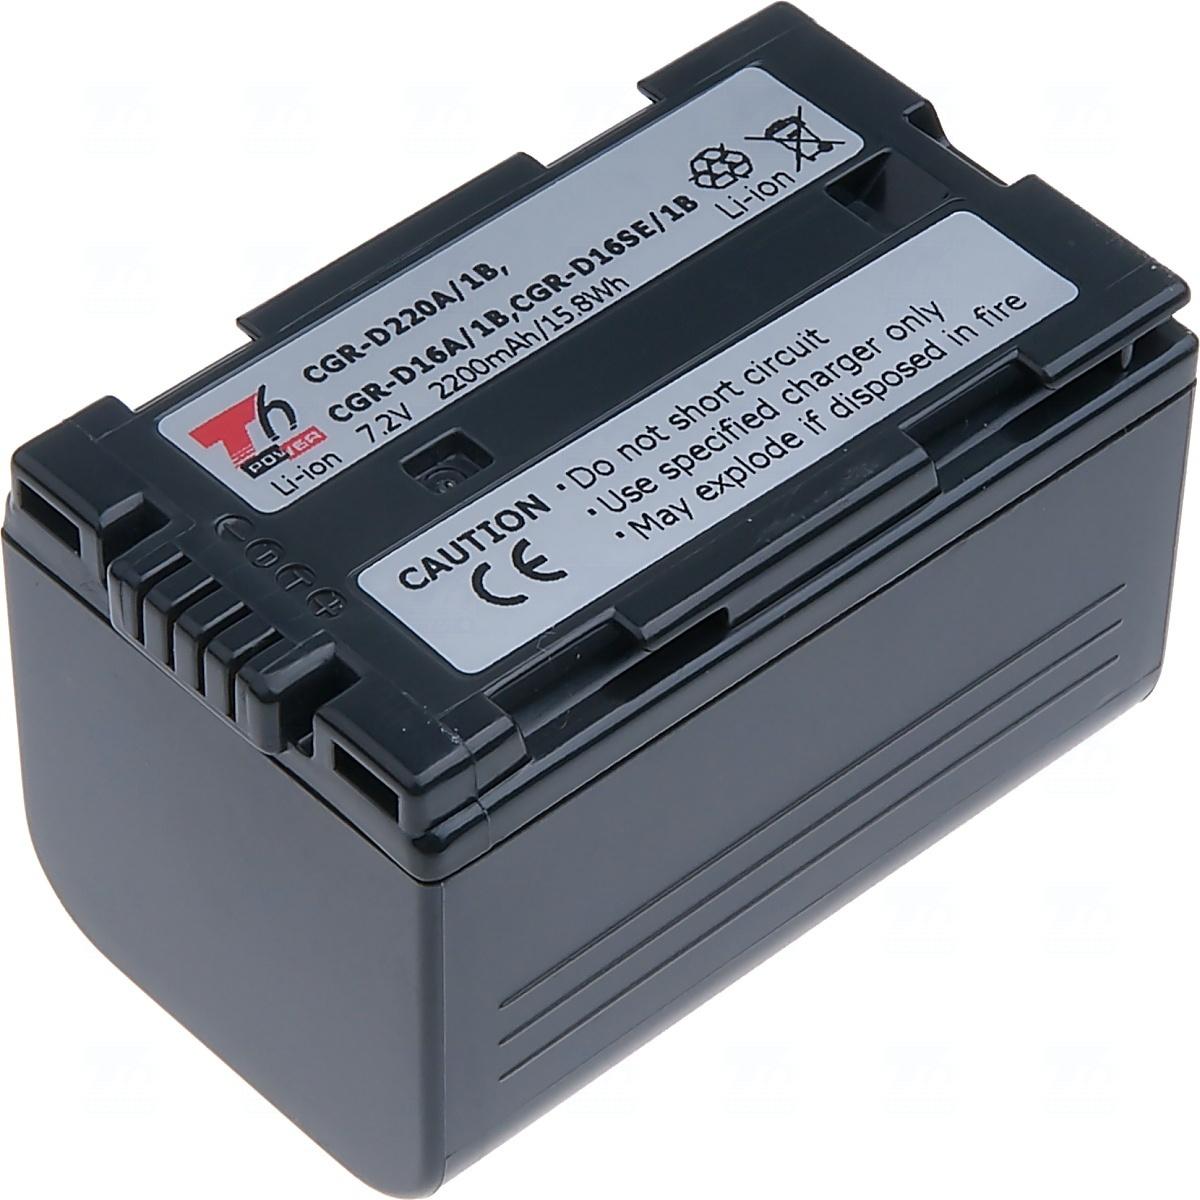 Baterie T6 power  CGR-D220A/1B, CGR-D16A/1B, CGR-D120, CGR-D08, CGR-D210, CGR-D320, CGR-D28S, CGP-D28S, VW-VBD21, šedá